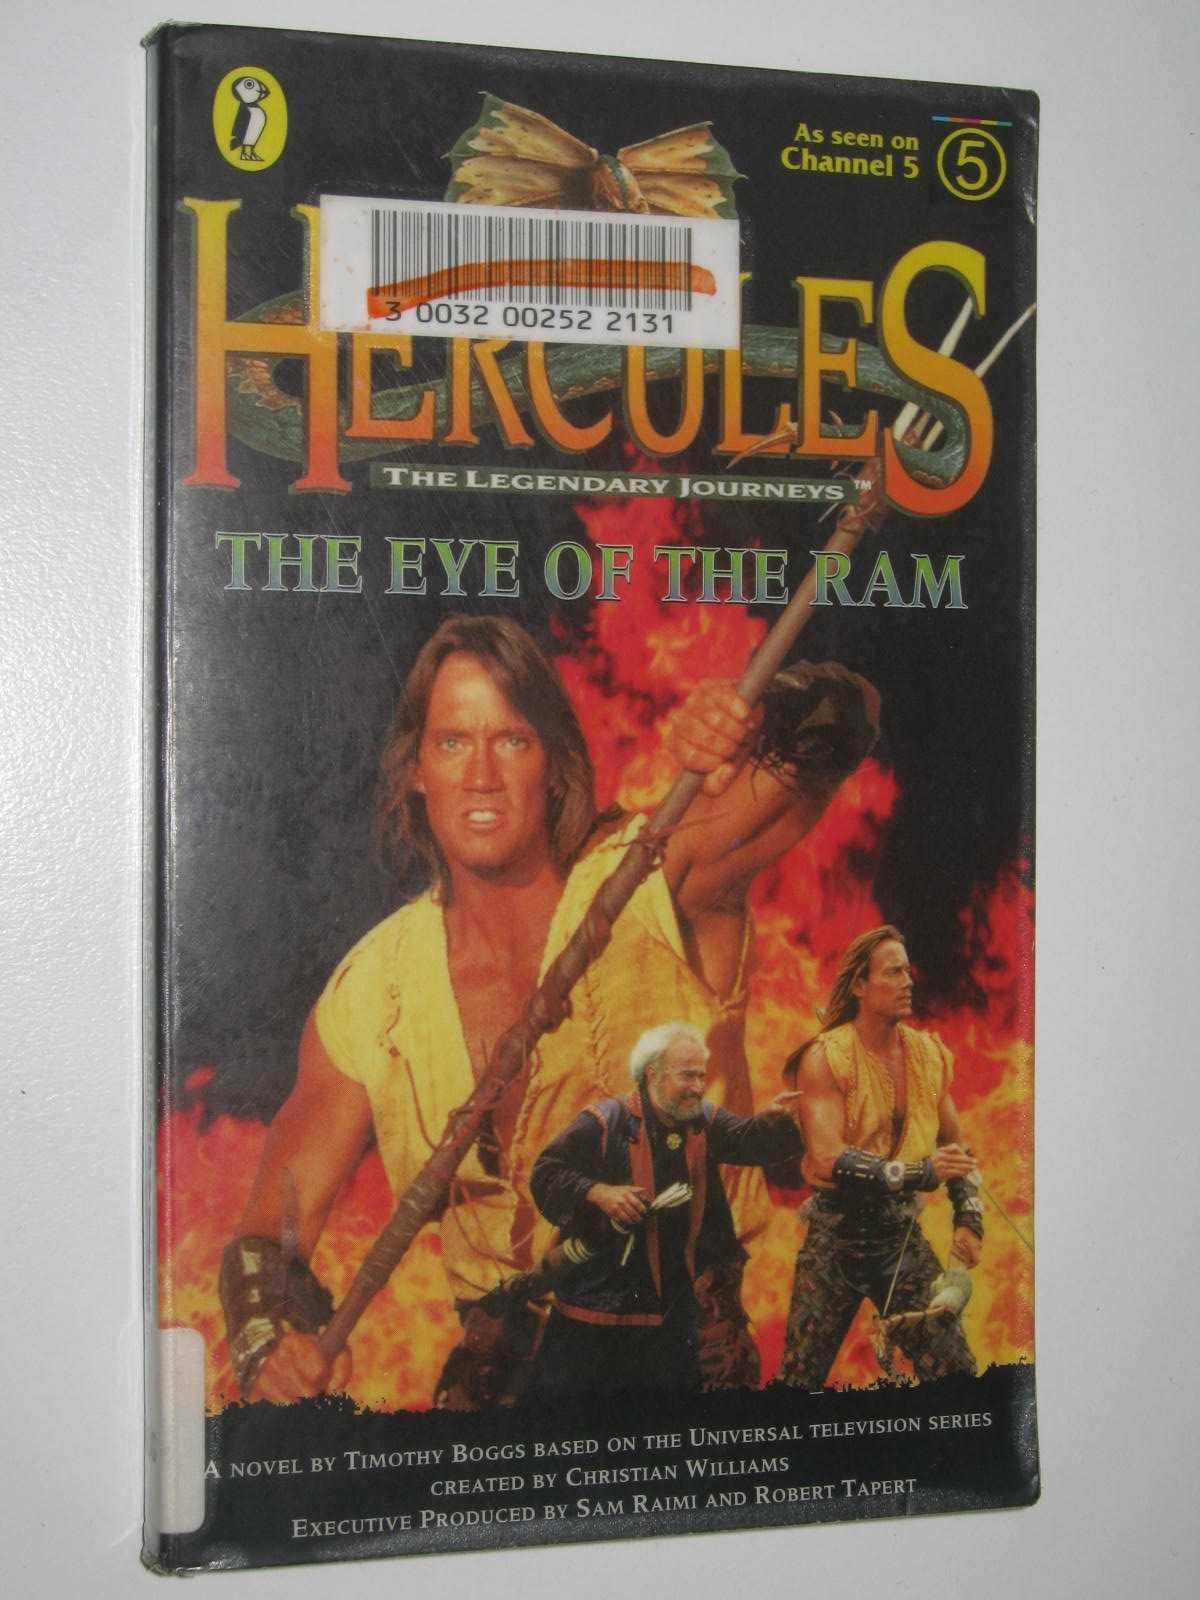 Image for The Eye Of The Ram - Hercules: The Legendary Journeys Series #3